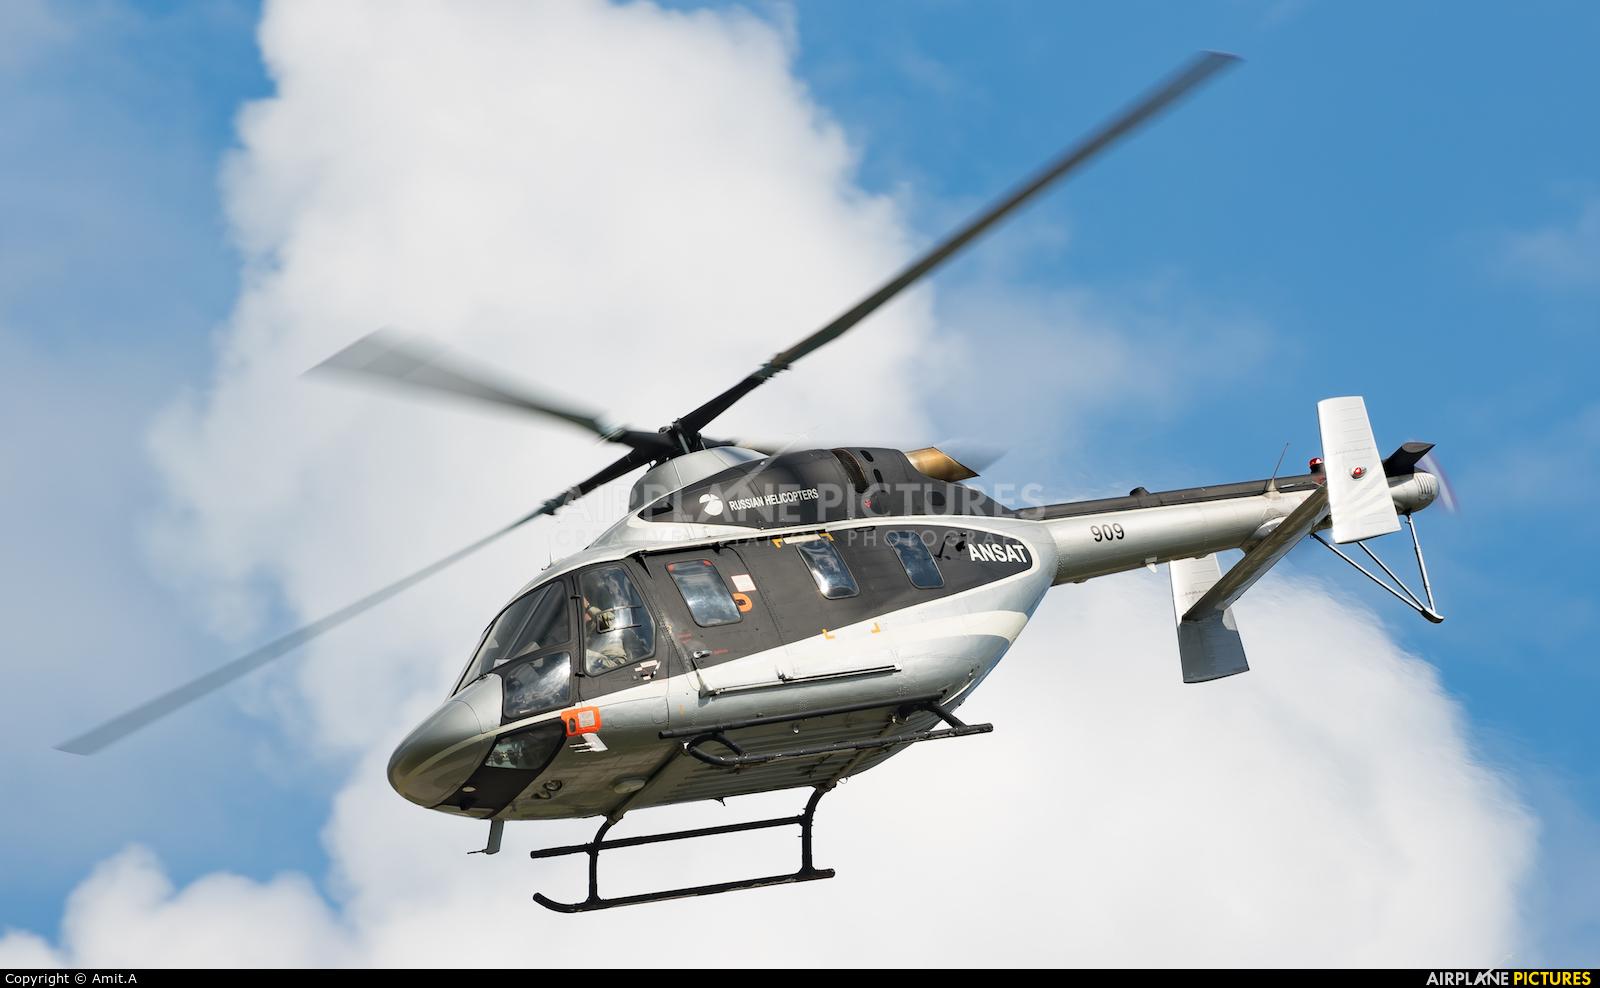 Russian Helicopters 909 aircraft at Ramenskoye - Zhukovsky